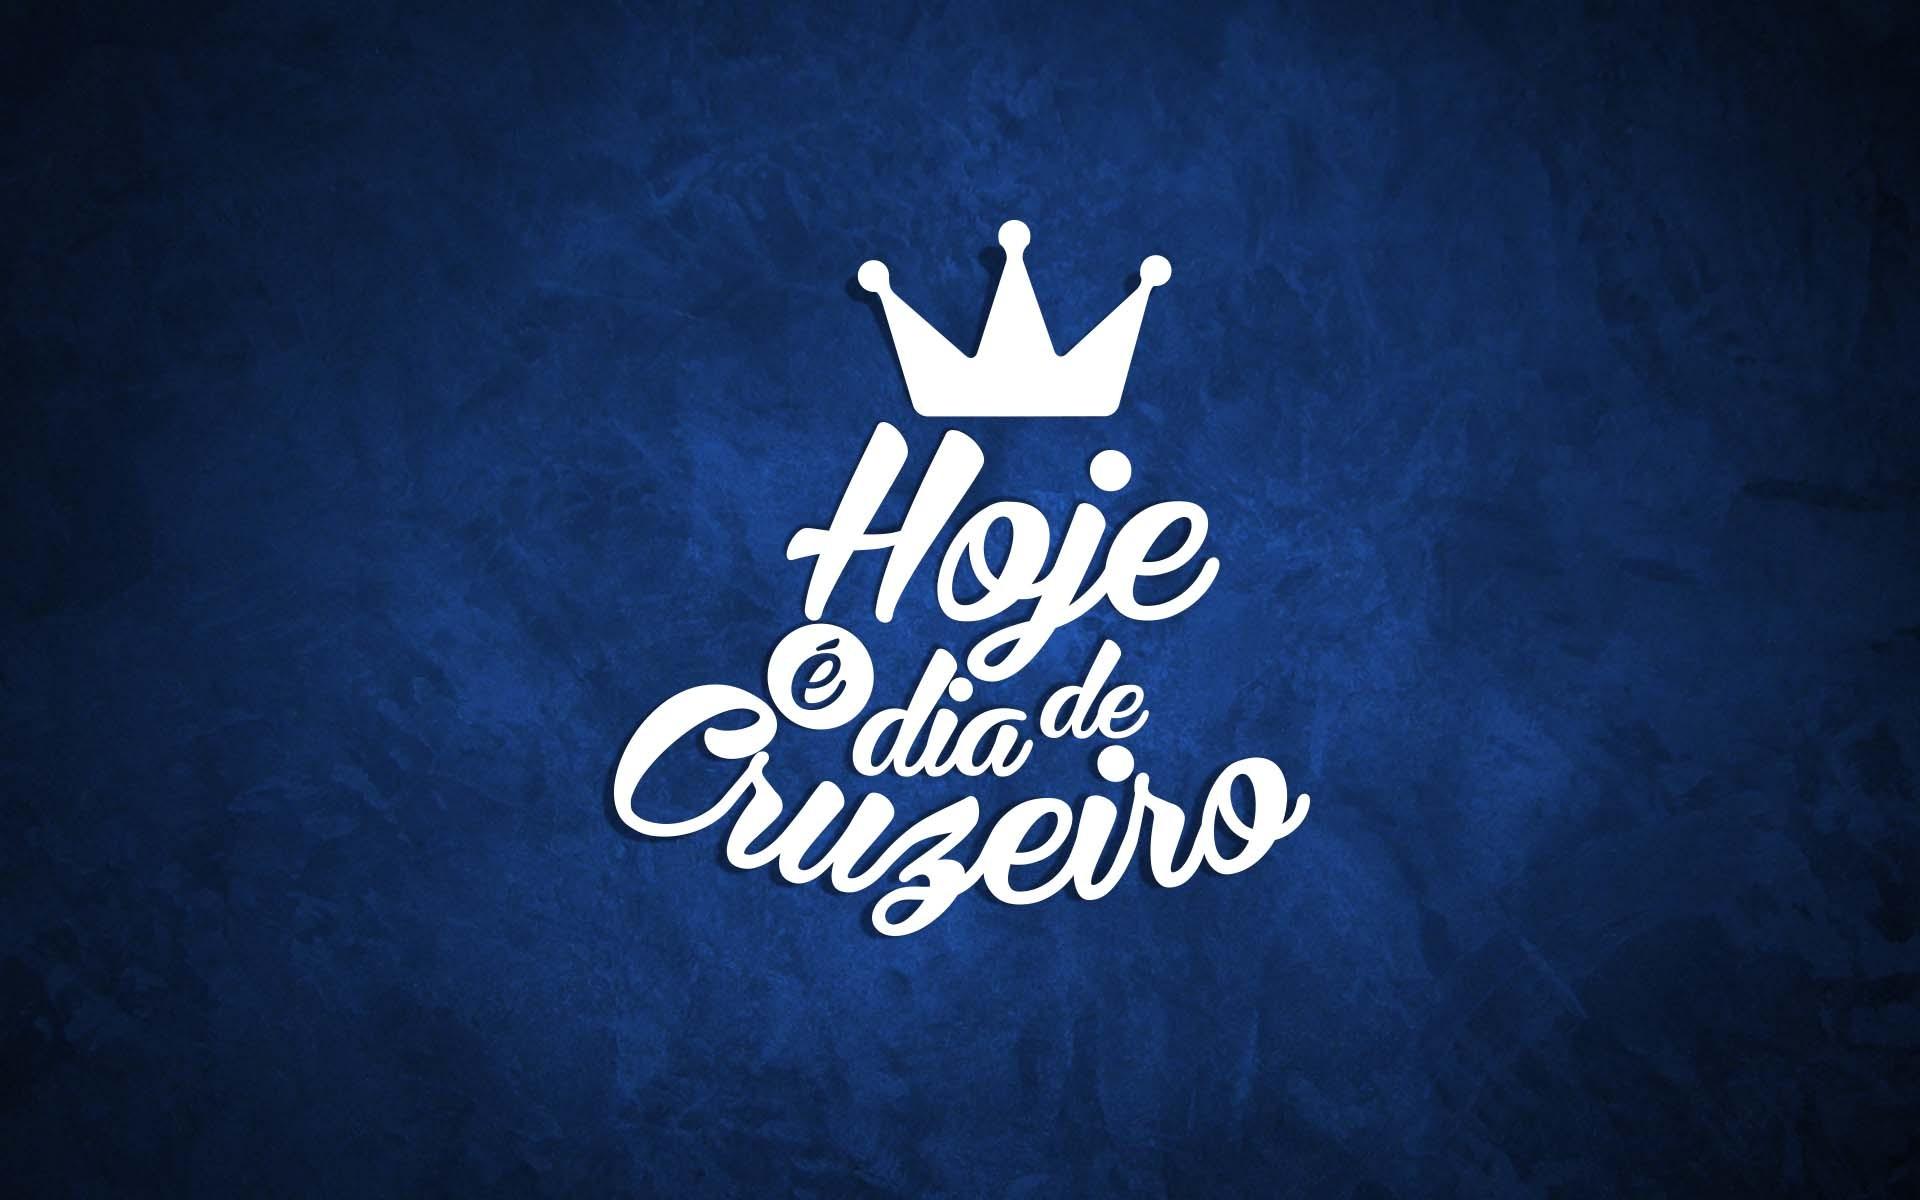 illustration text logo soccer clubs Brazil brand Cruzeiro Esporte Clube  darkness 1920x1200 px computer wallpaper font a04ddce09ef3d